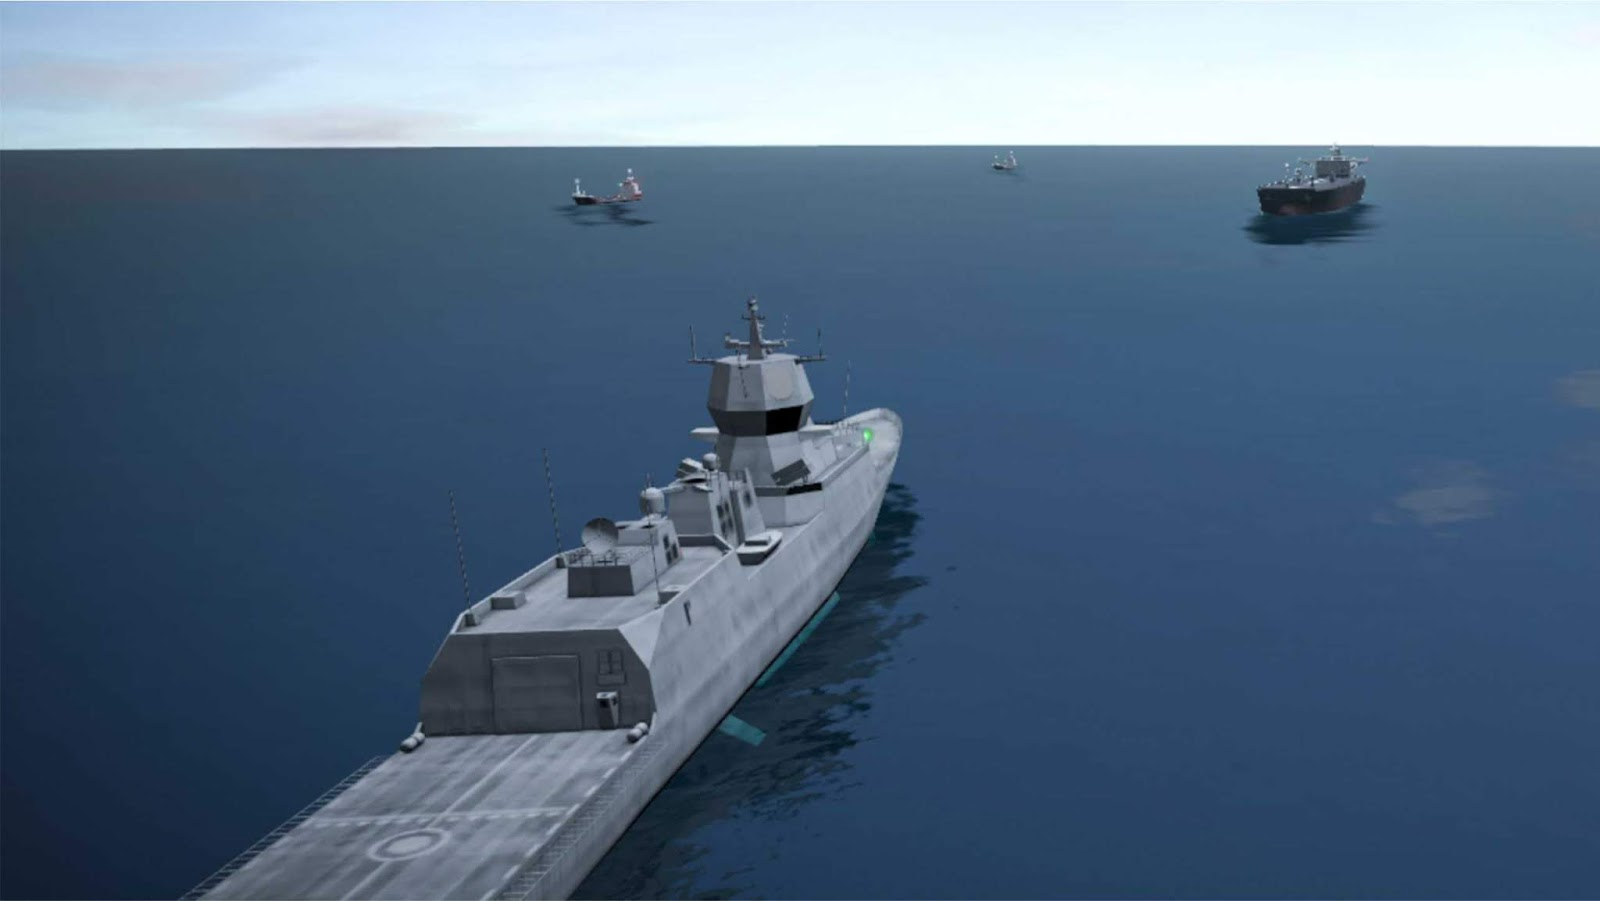 Rekonstruksi 3D tabrakan kapal tanker dengan fregat Norwegia KNM Helge Ingstad